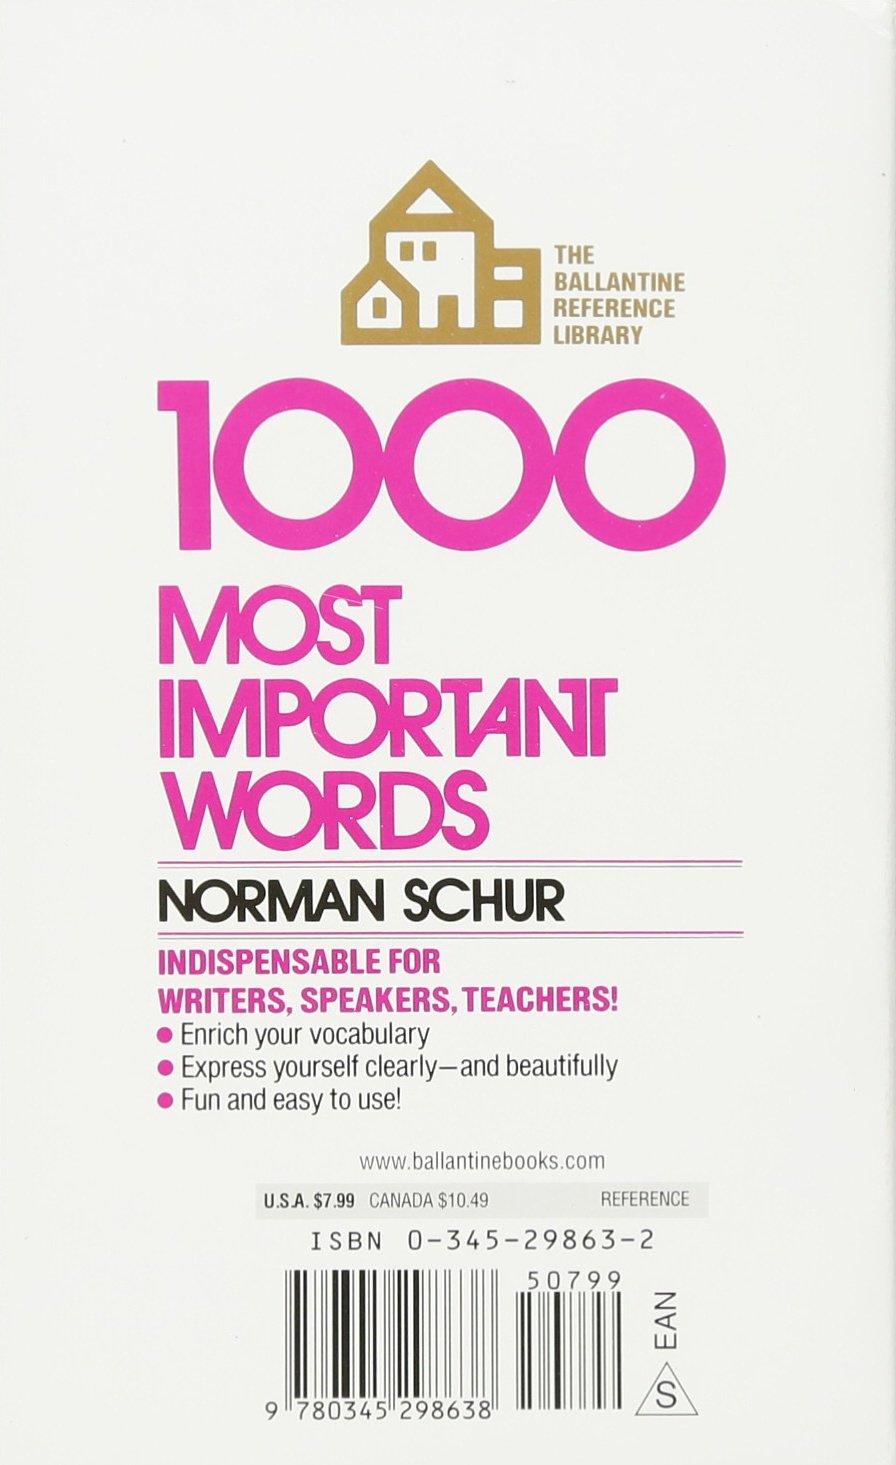 Norman W. Schur